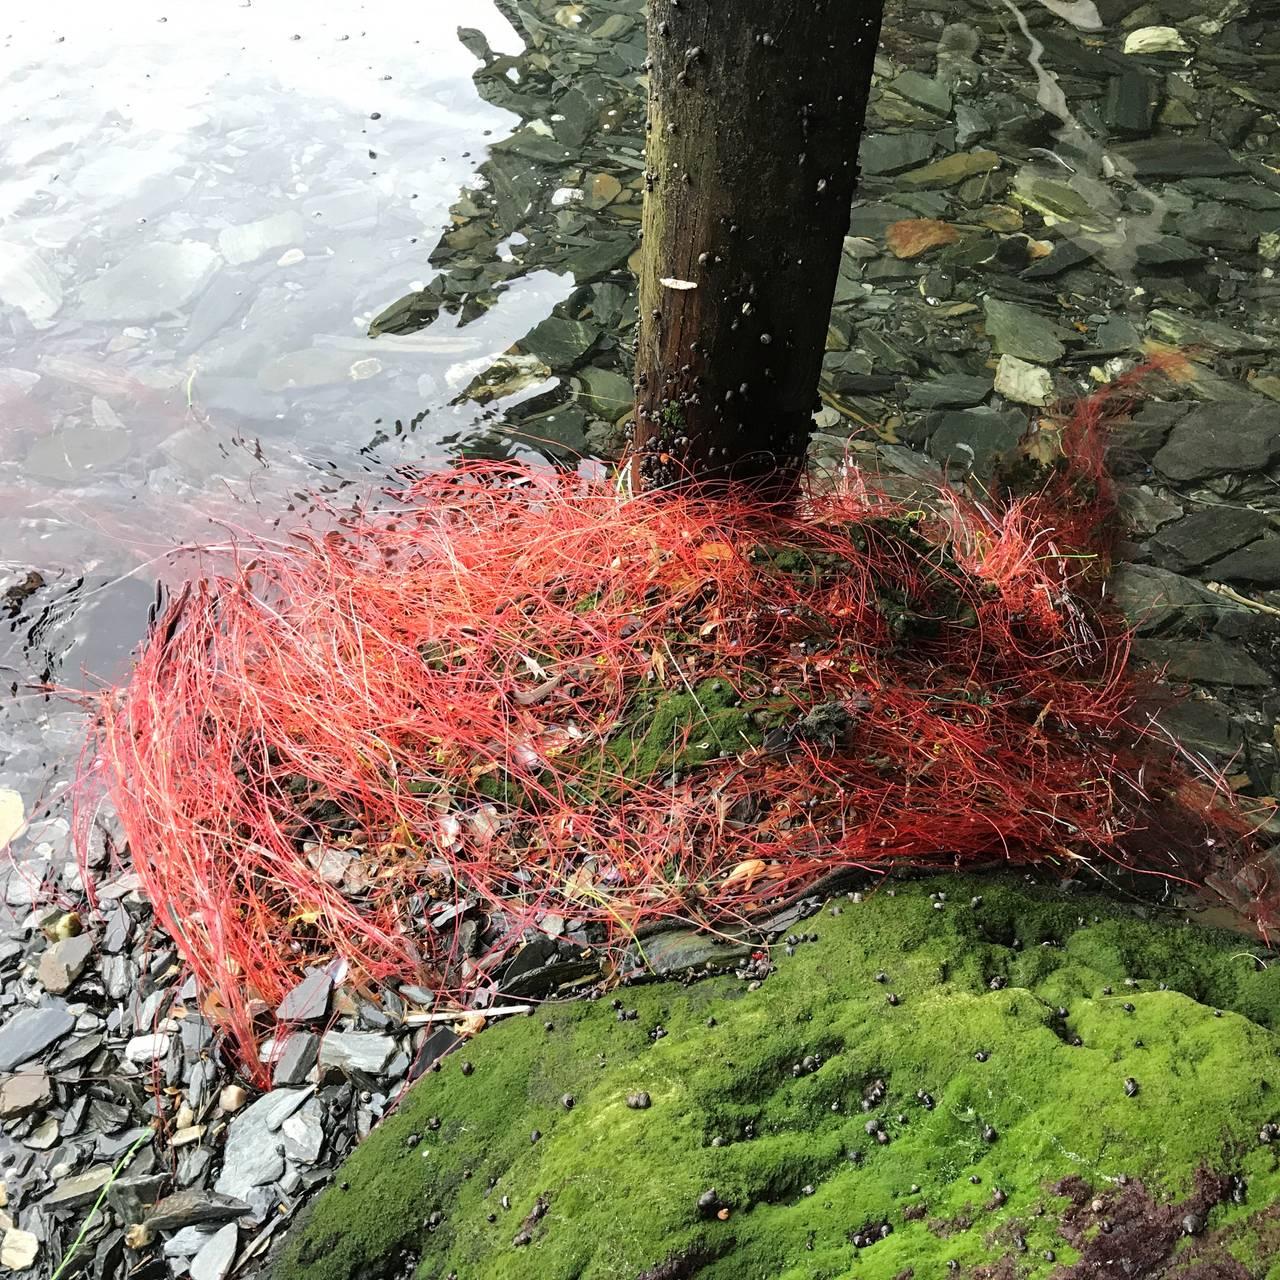 Miljøkriminalitet i Berlevåg kommune